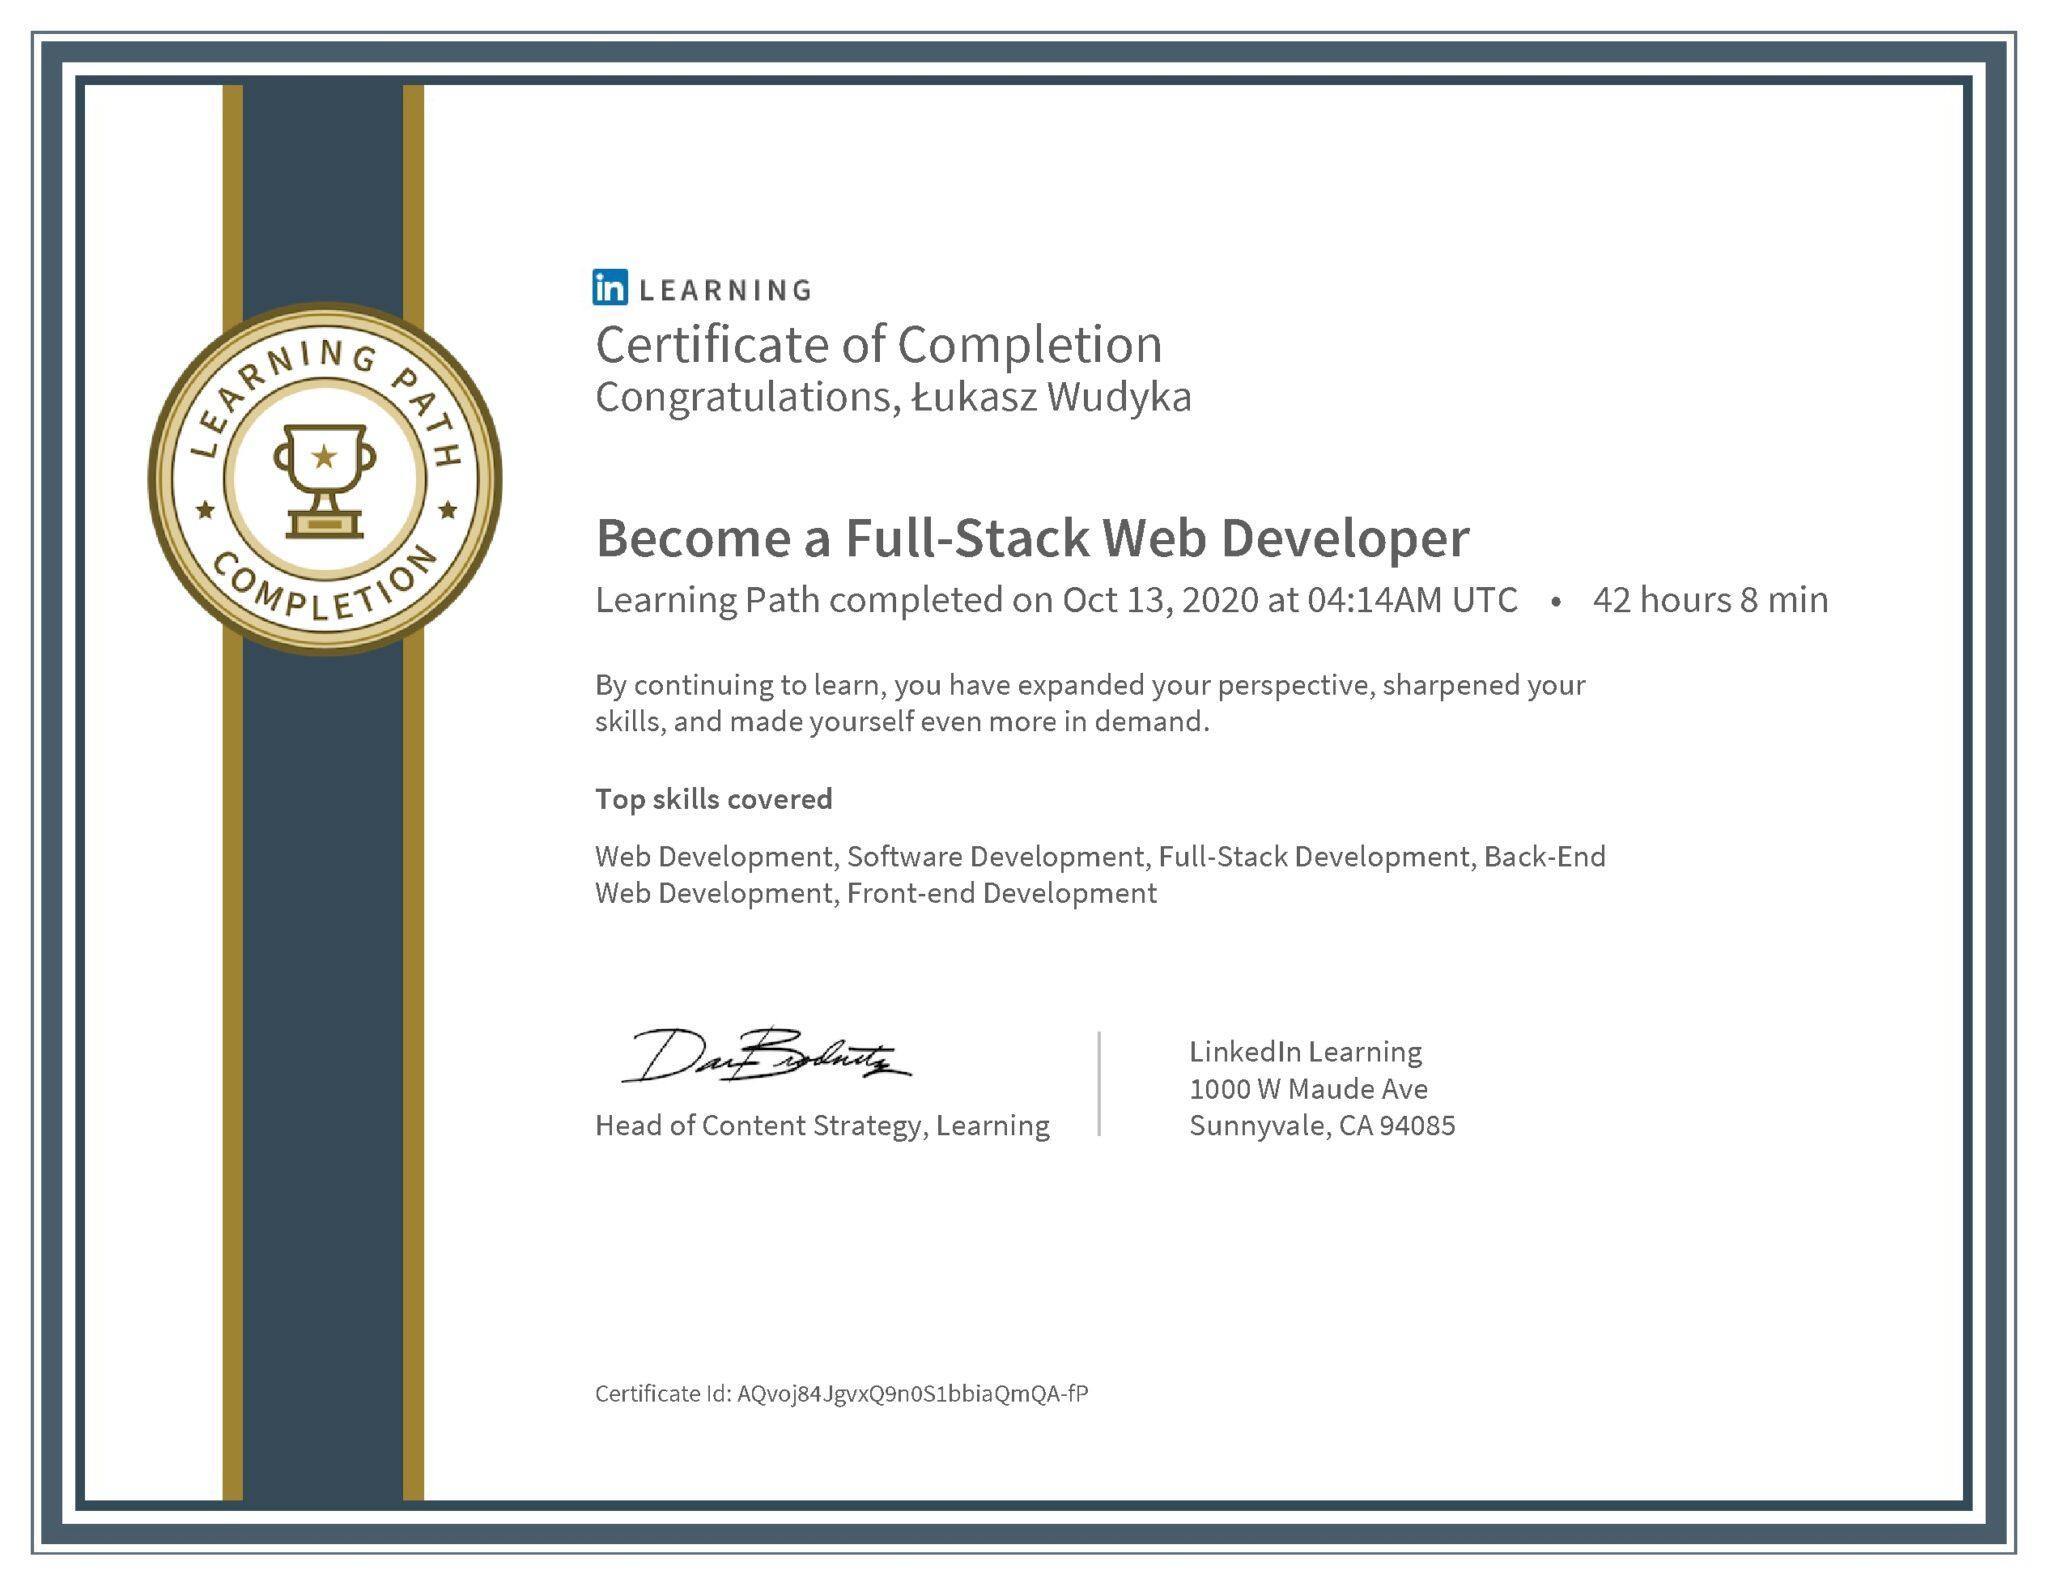 Łukasz Wudyka certyfikat LinkedIn Become a Full-Stack Web Developer